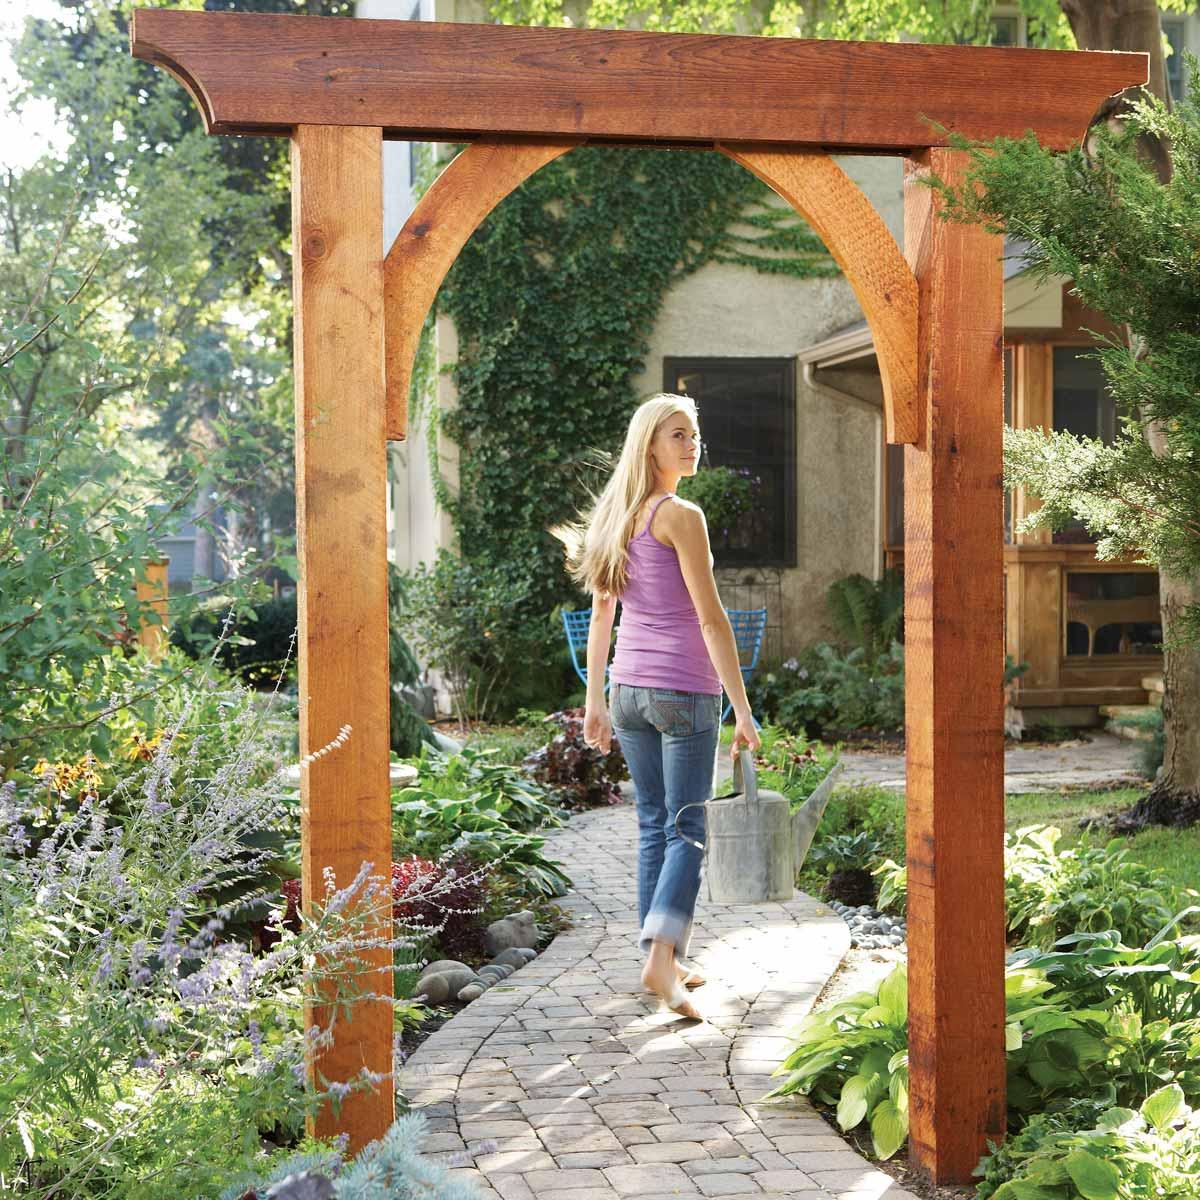 Simple garden arch DIY Garden Plans Arch Ideas To Create Beautiful Welcoming Frame